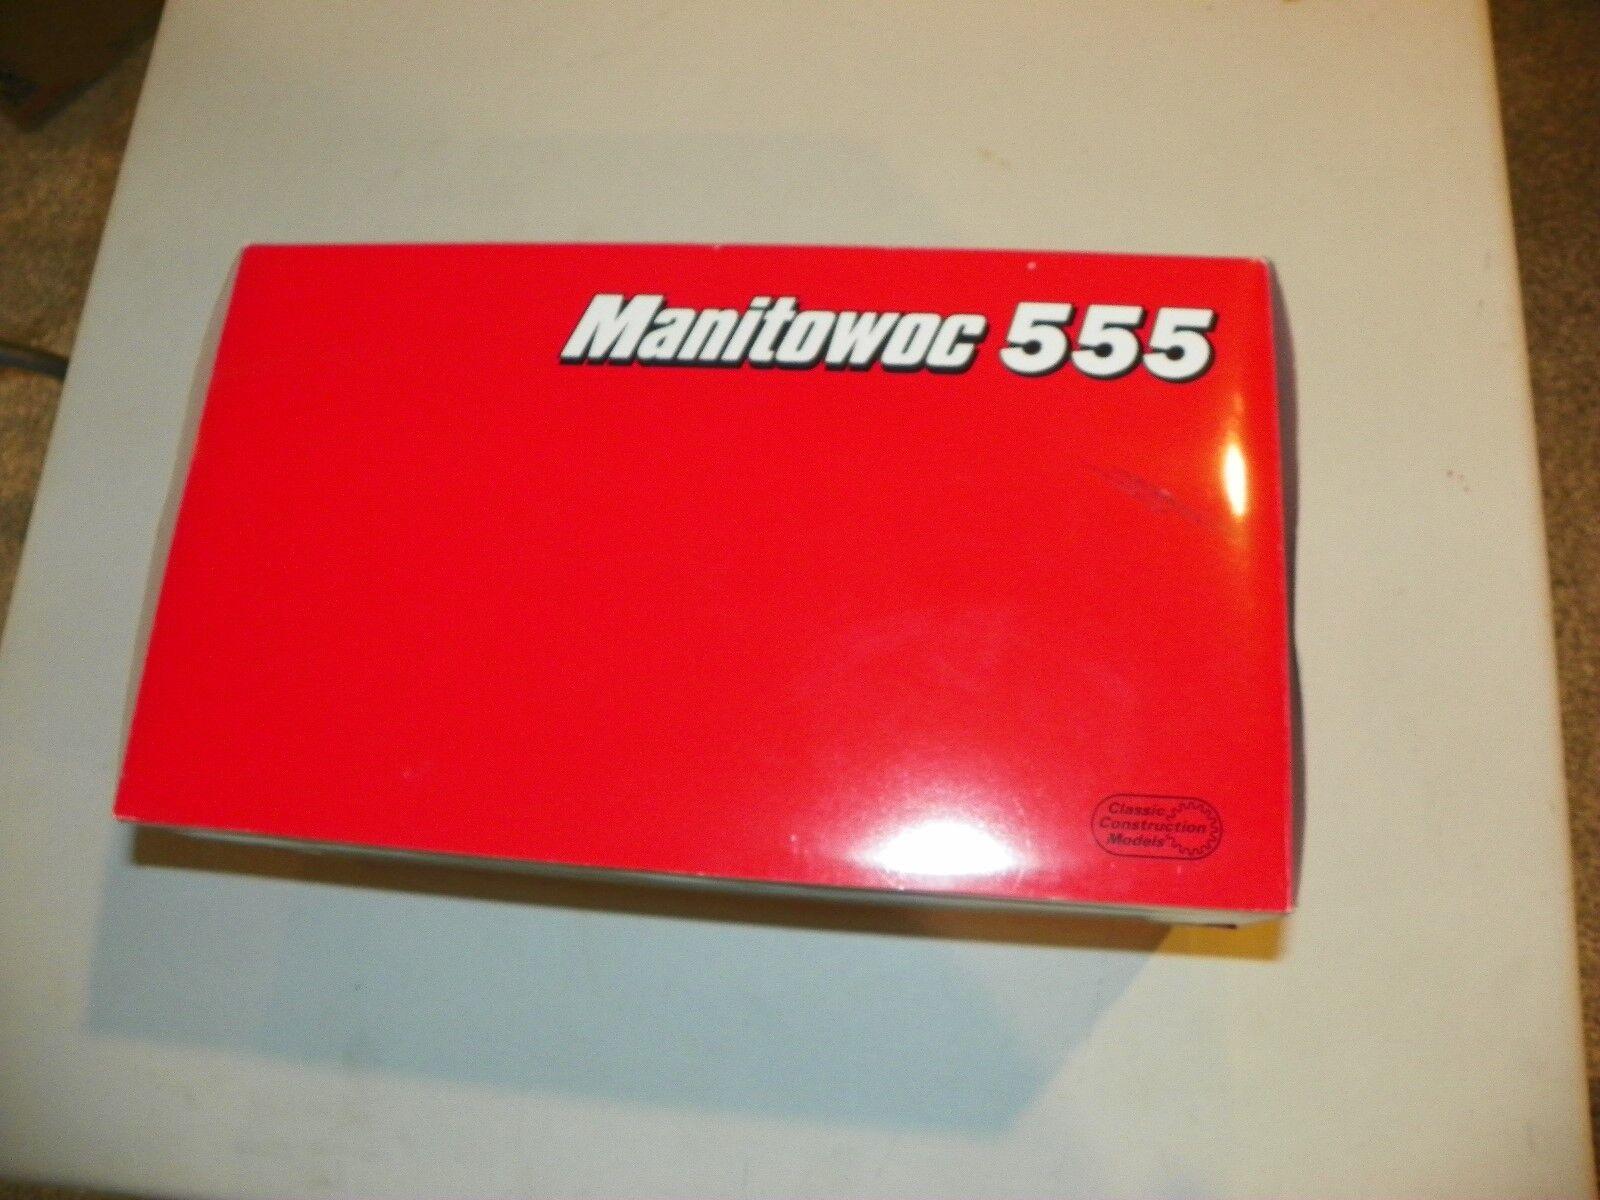 CCM Manitowoc 555 1 50 Scale Die Cast Model Lattice Boom Crane New In Box